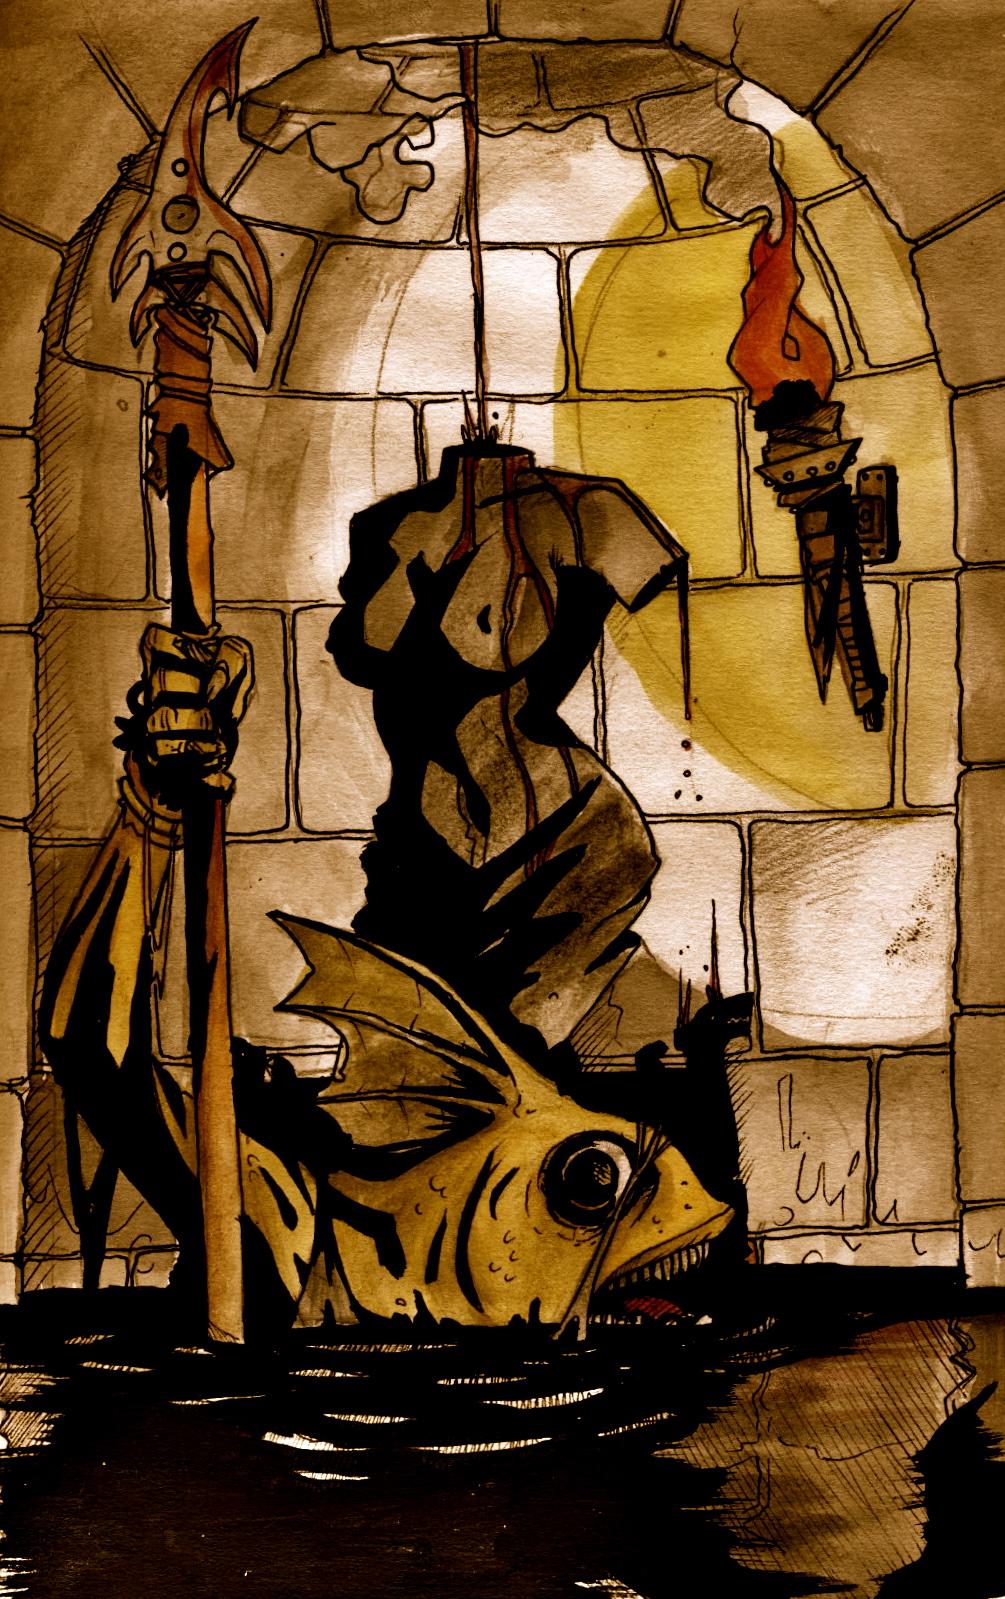 the fish man's lair